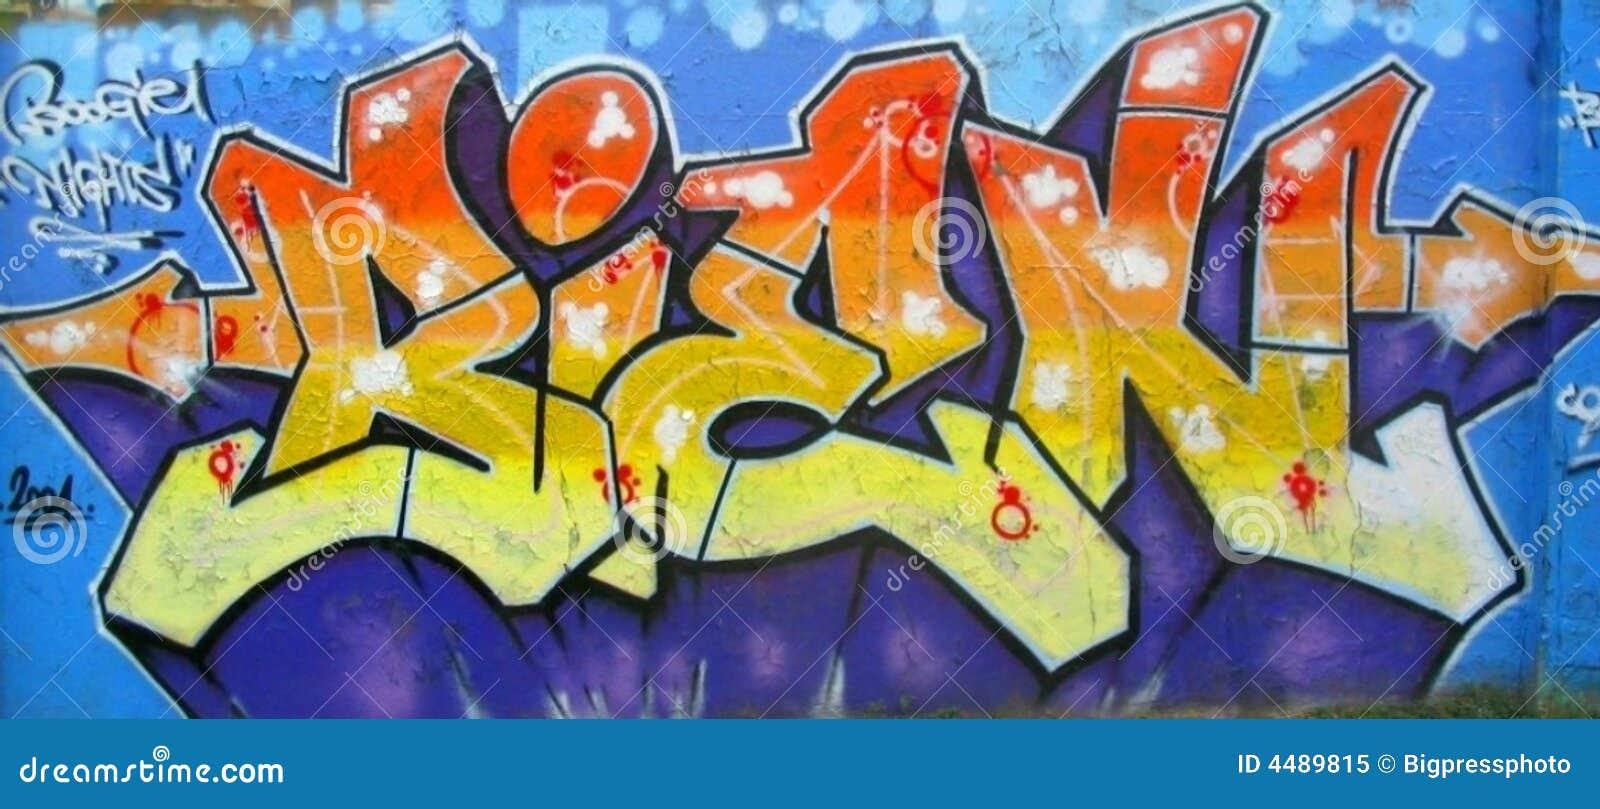 Abstract Graffiti Wall Royalty-Free Stock Photo | CartoonDealer.com ...